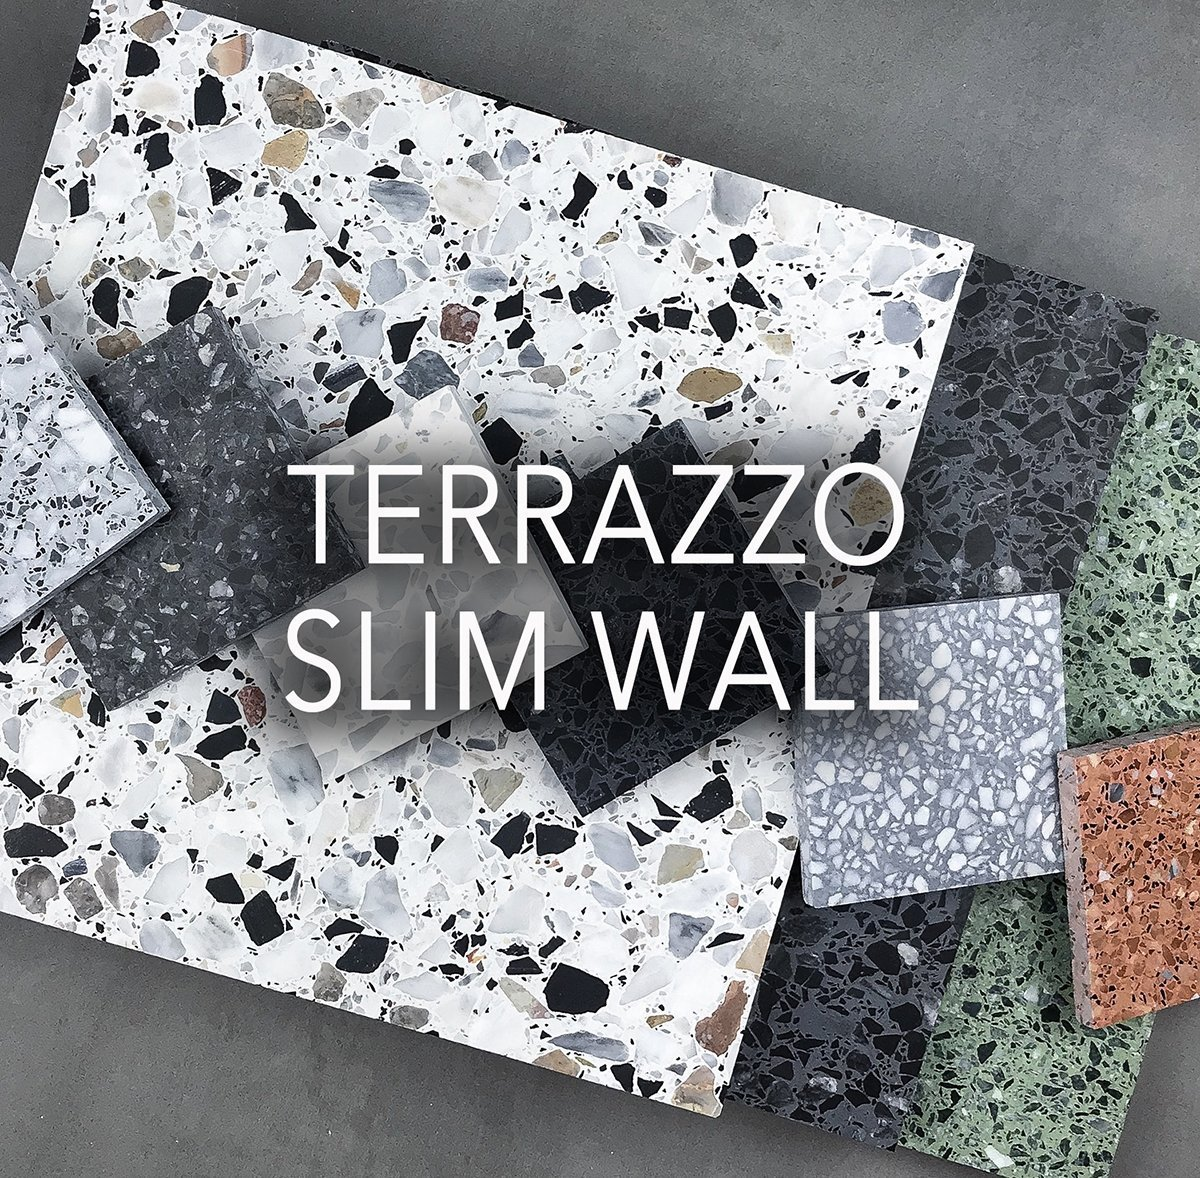 Terrazzo Slim wall